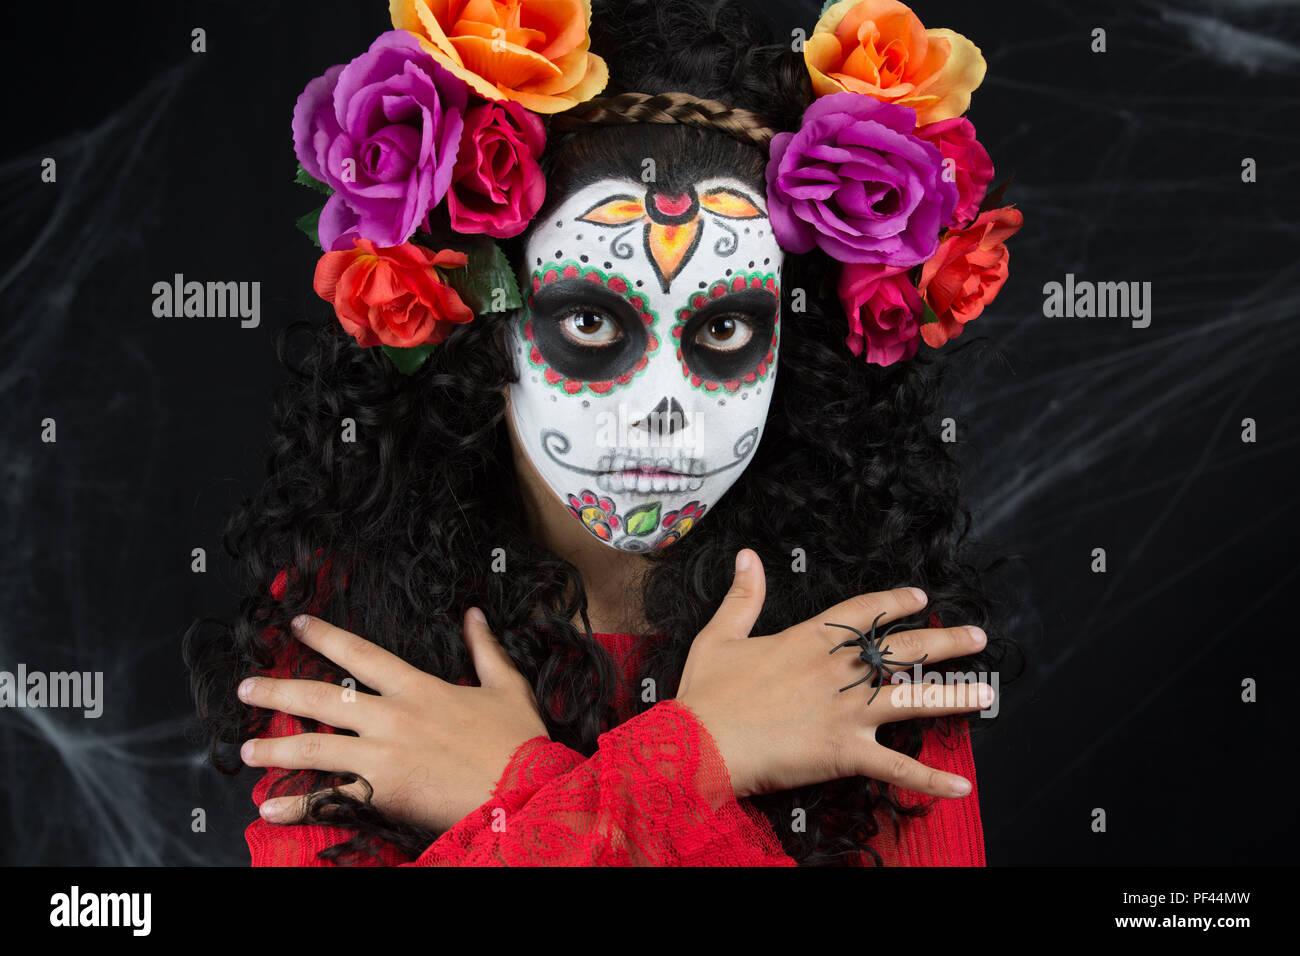 97956b86d Little girl with sugar skull makeup. Dia de los Closeup portrait of  Calavera Catrina. Little girl with sugar skull makeup. Dia de los muertos.